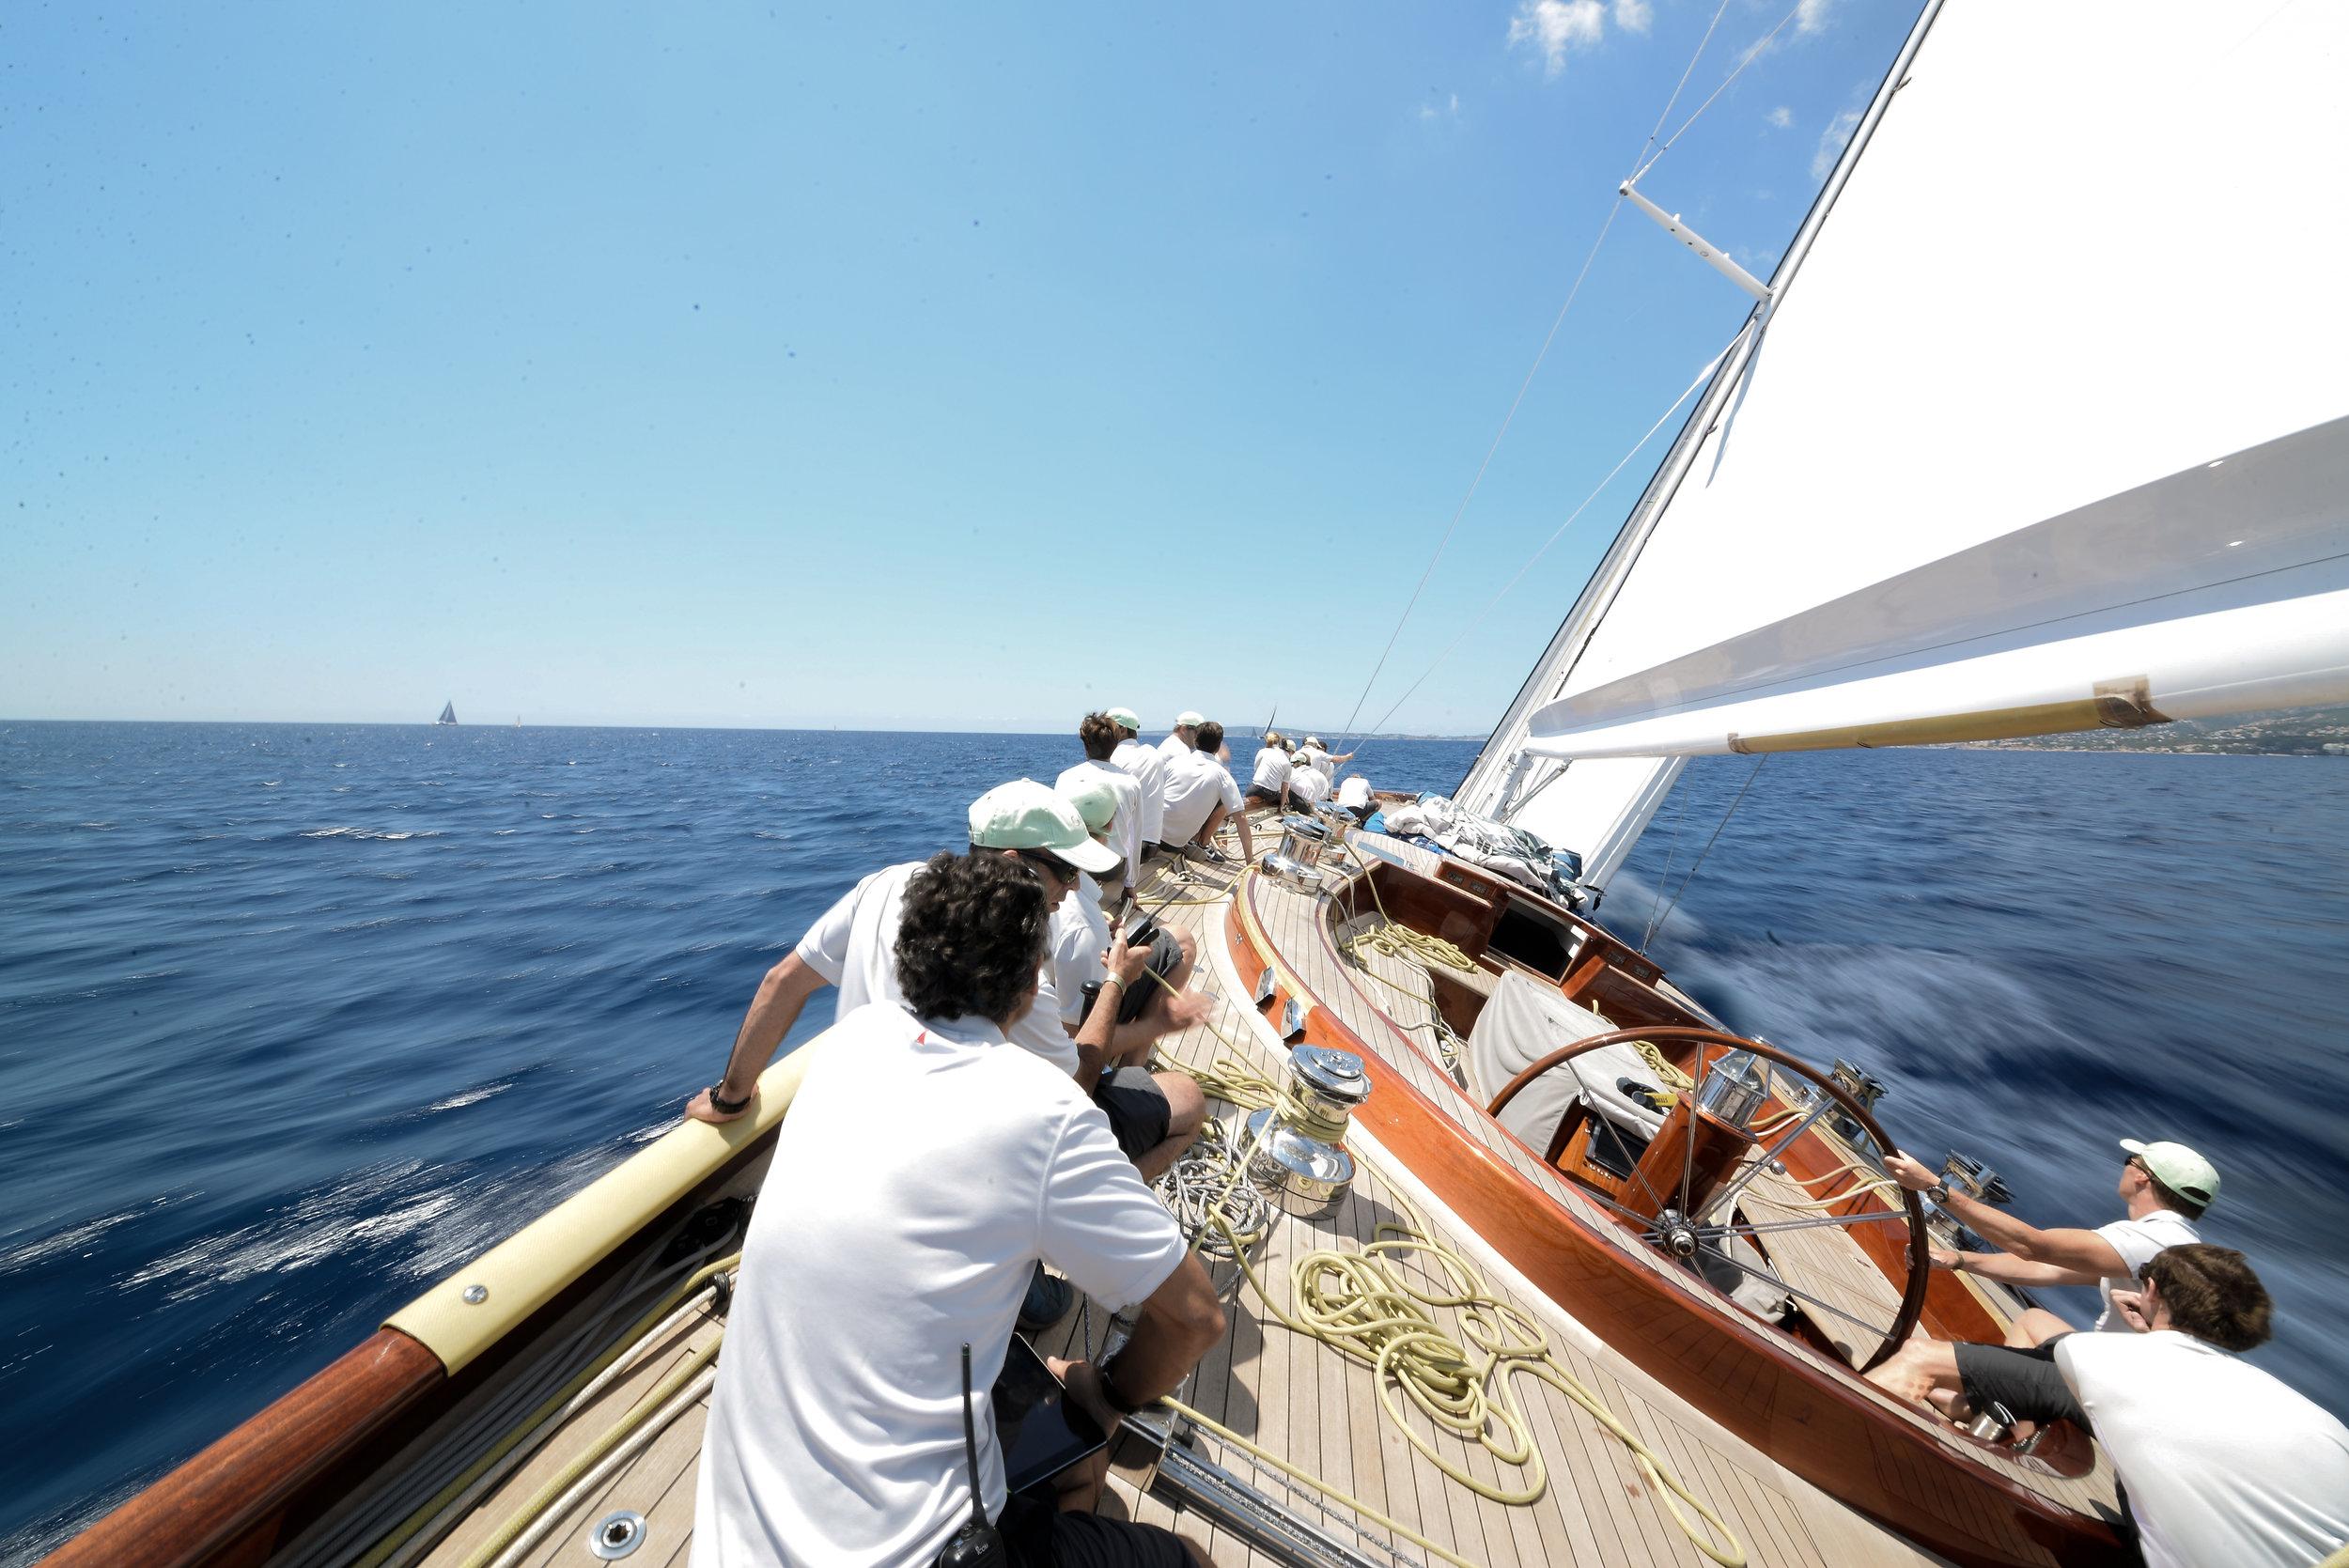 Gaia at Palma Superyacht Cup Credit David Zammit Photography.jpg